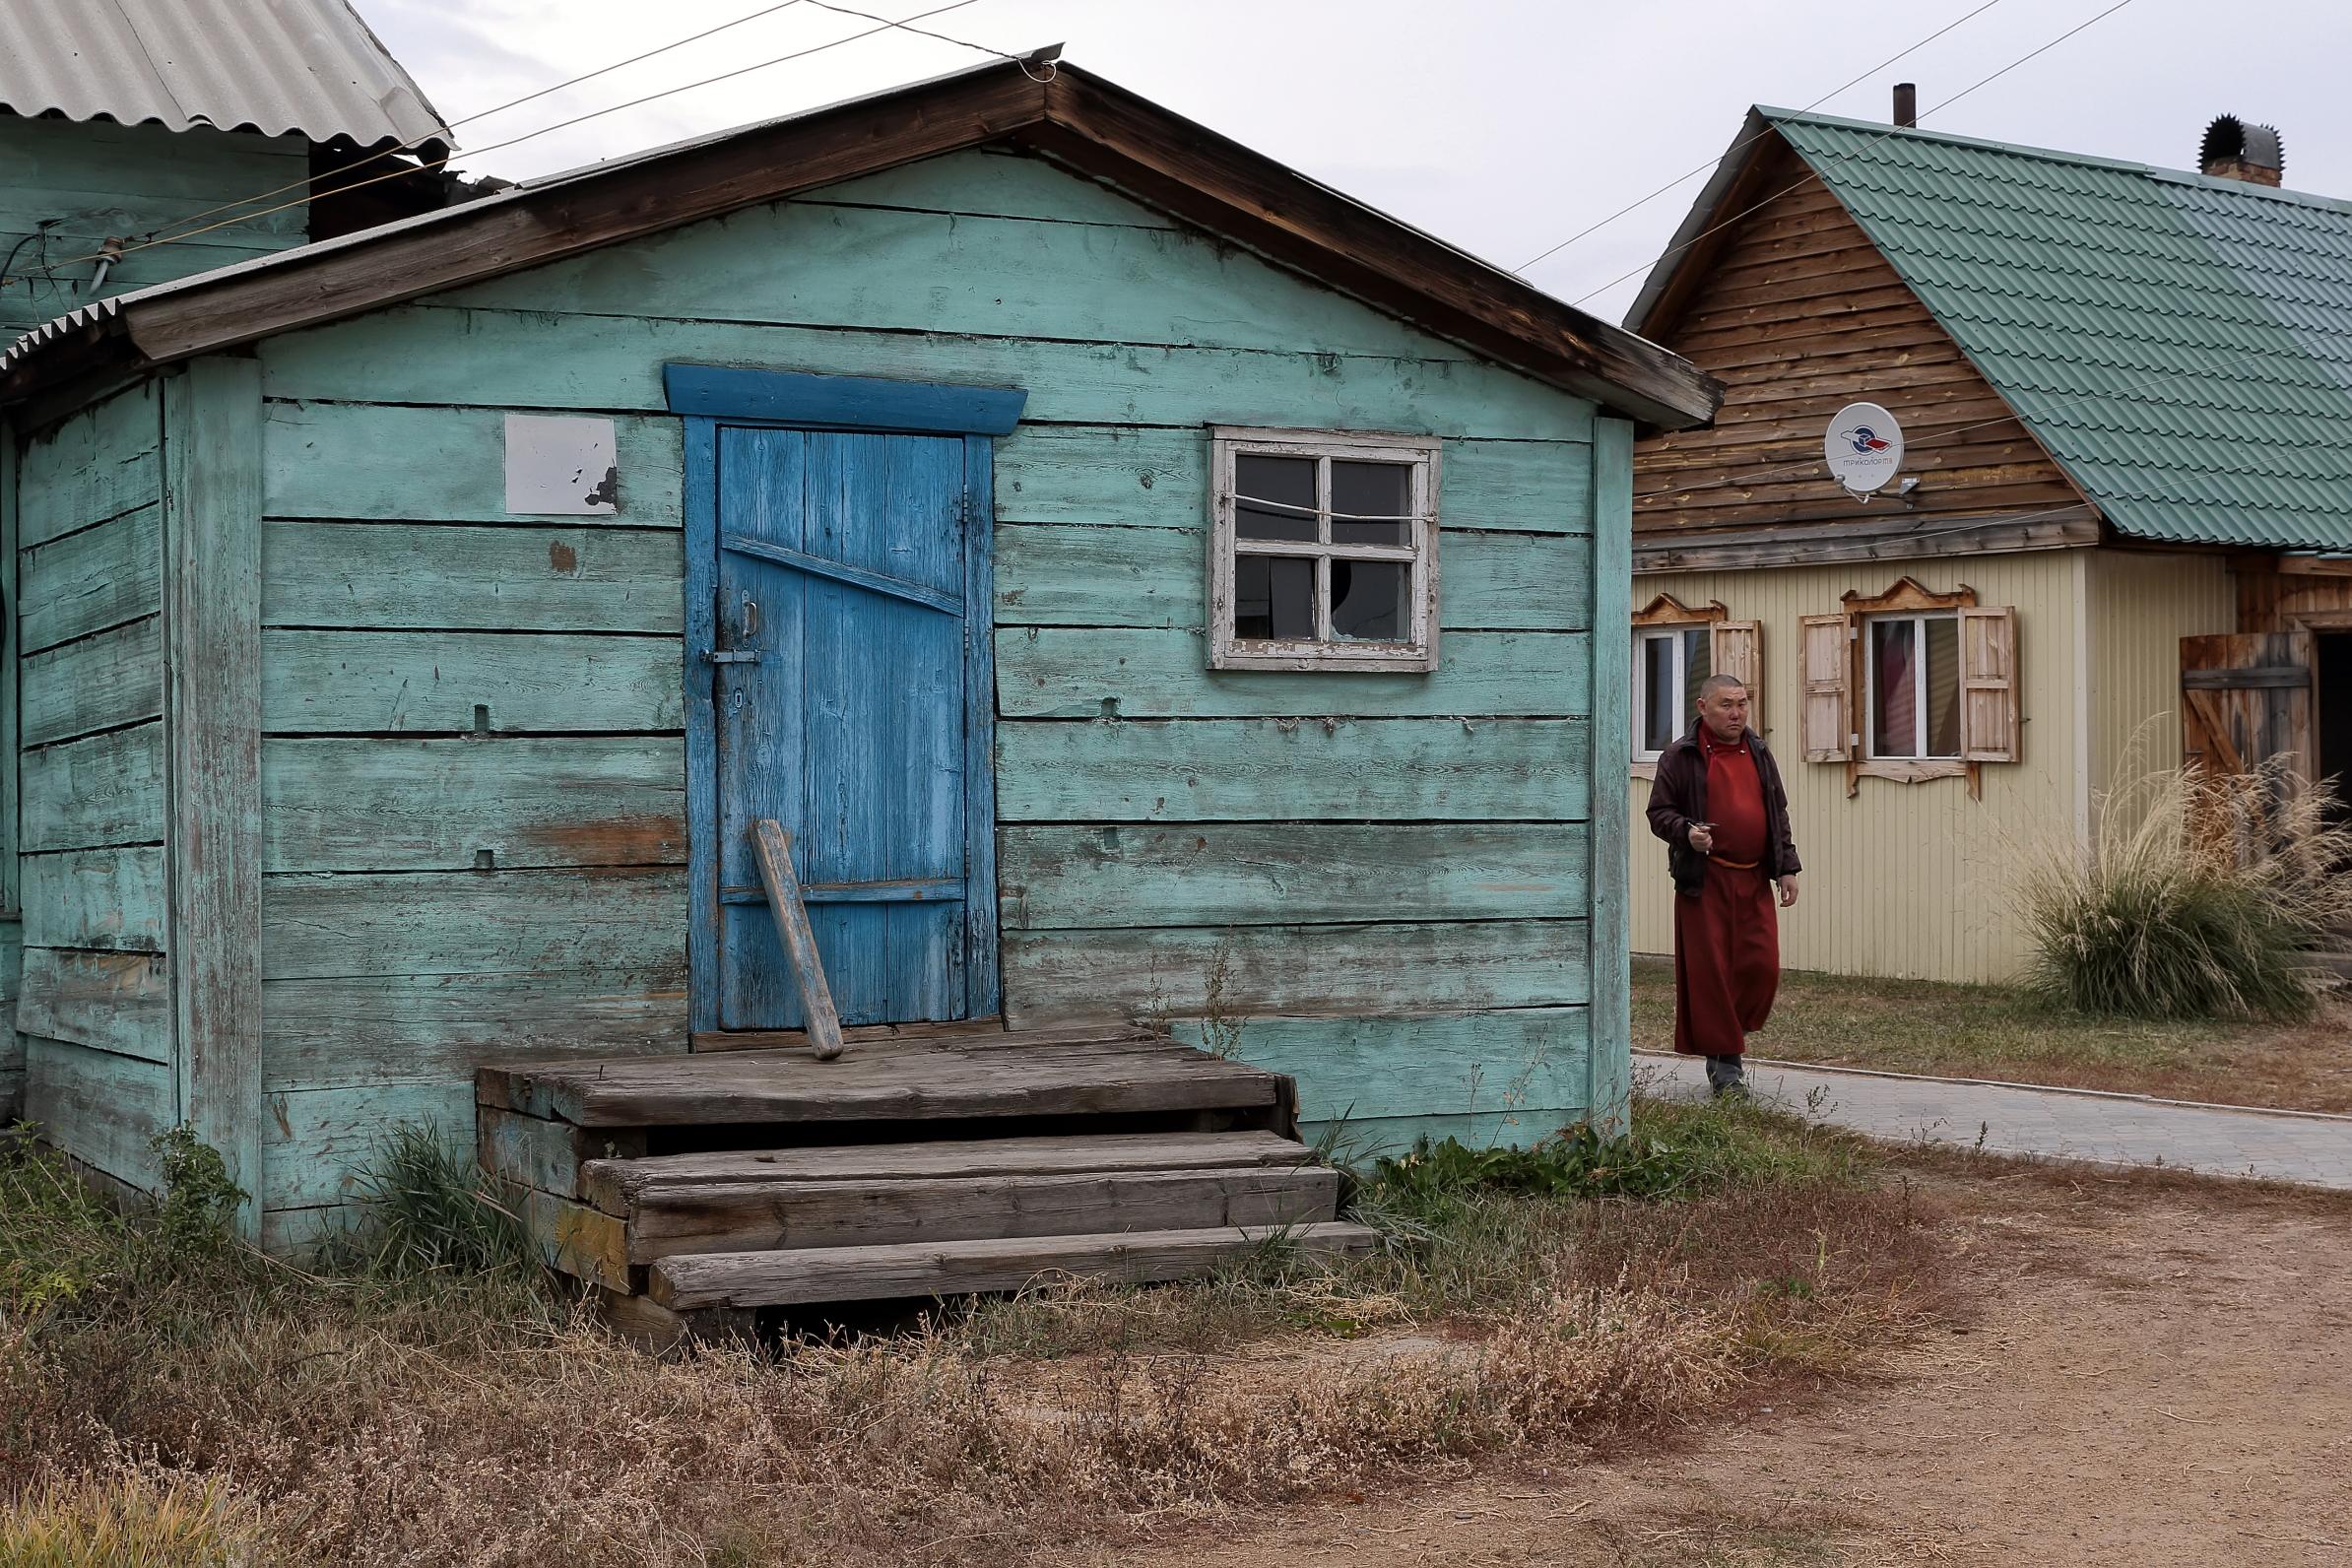 bajkal_138